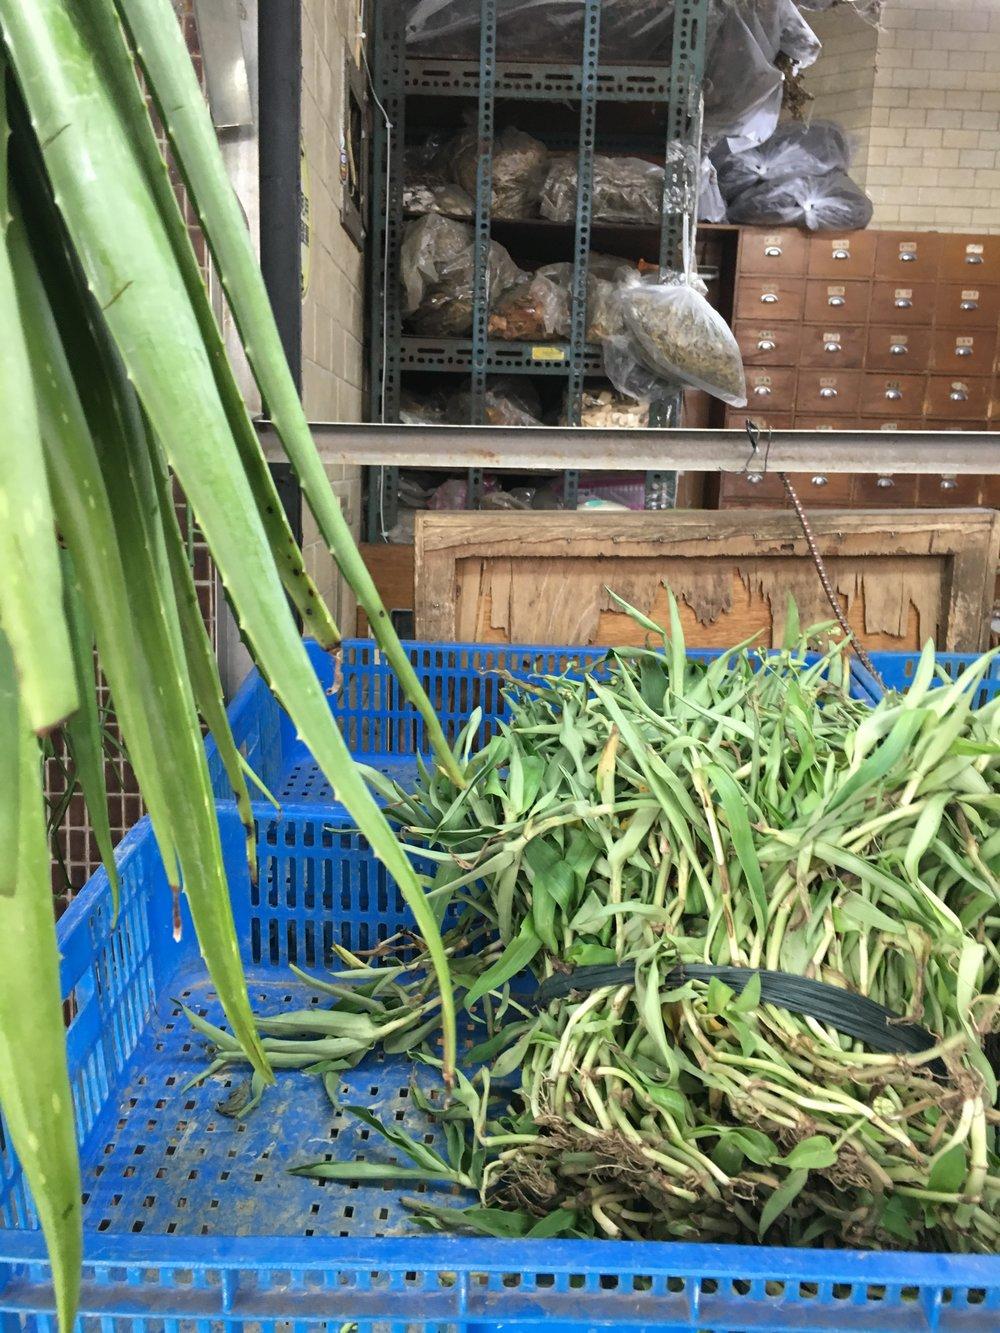 Herbs outside the shop